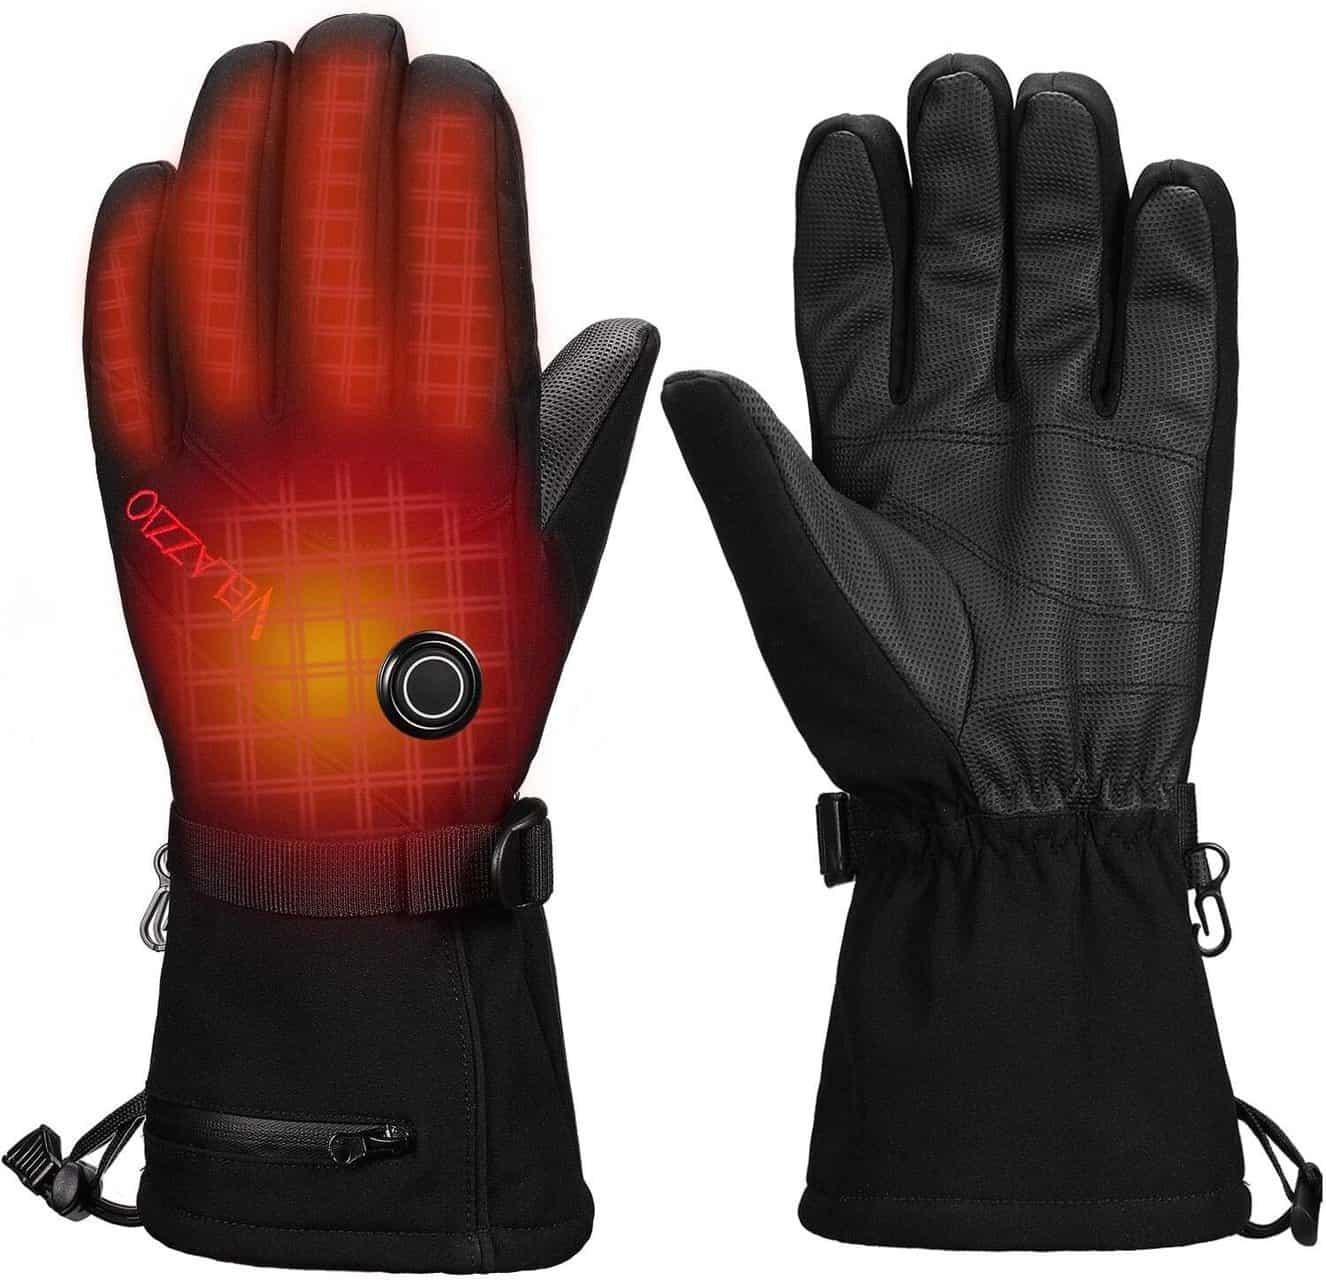 Battery Heated Winter Gloves by Velazzio